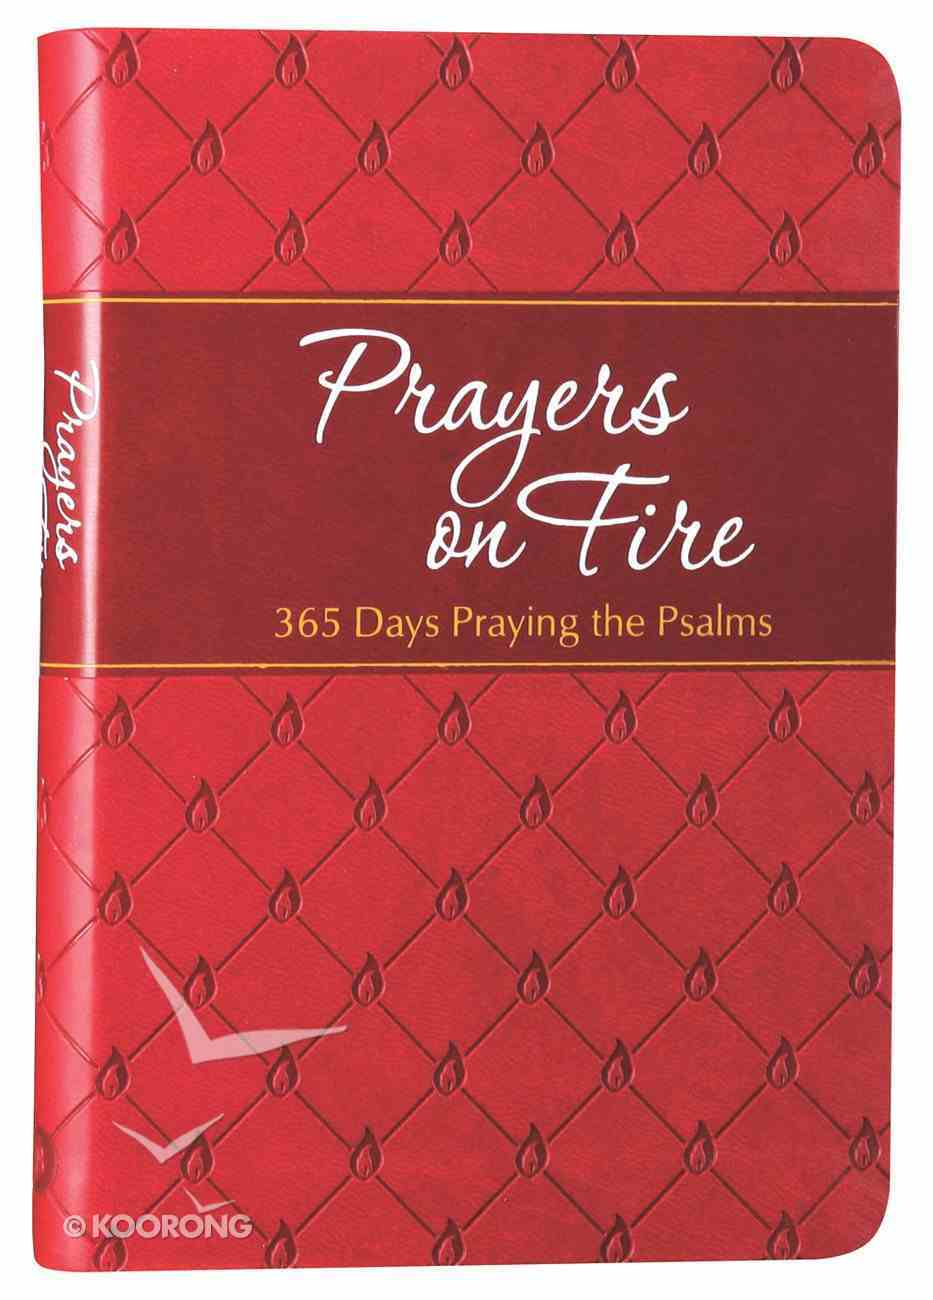 Prayers on Fire: 365 Days Praying the Psalms Imitation Leather